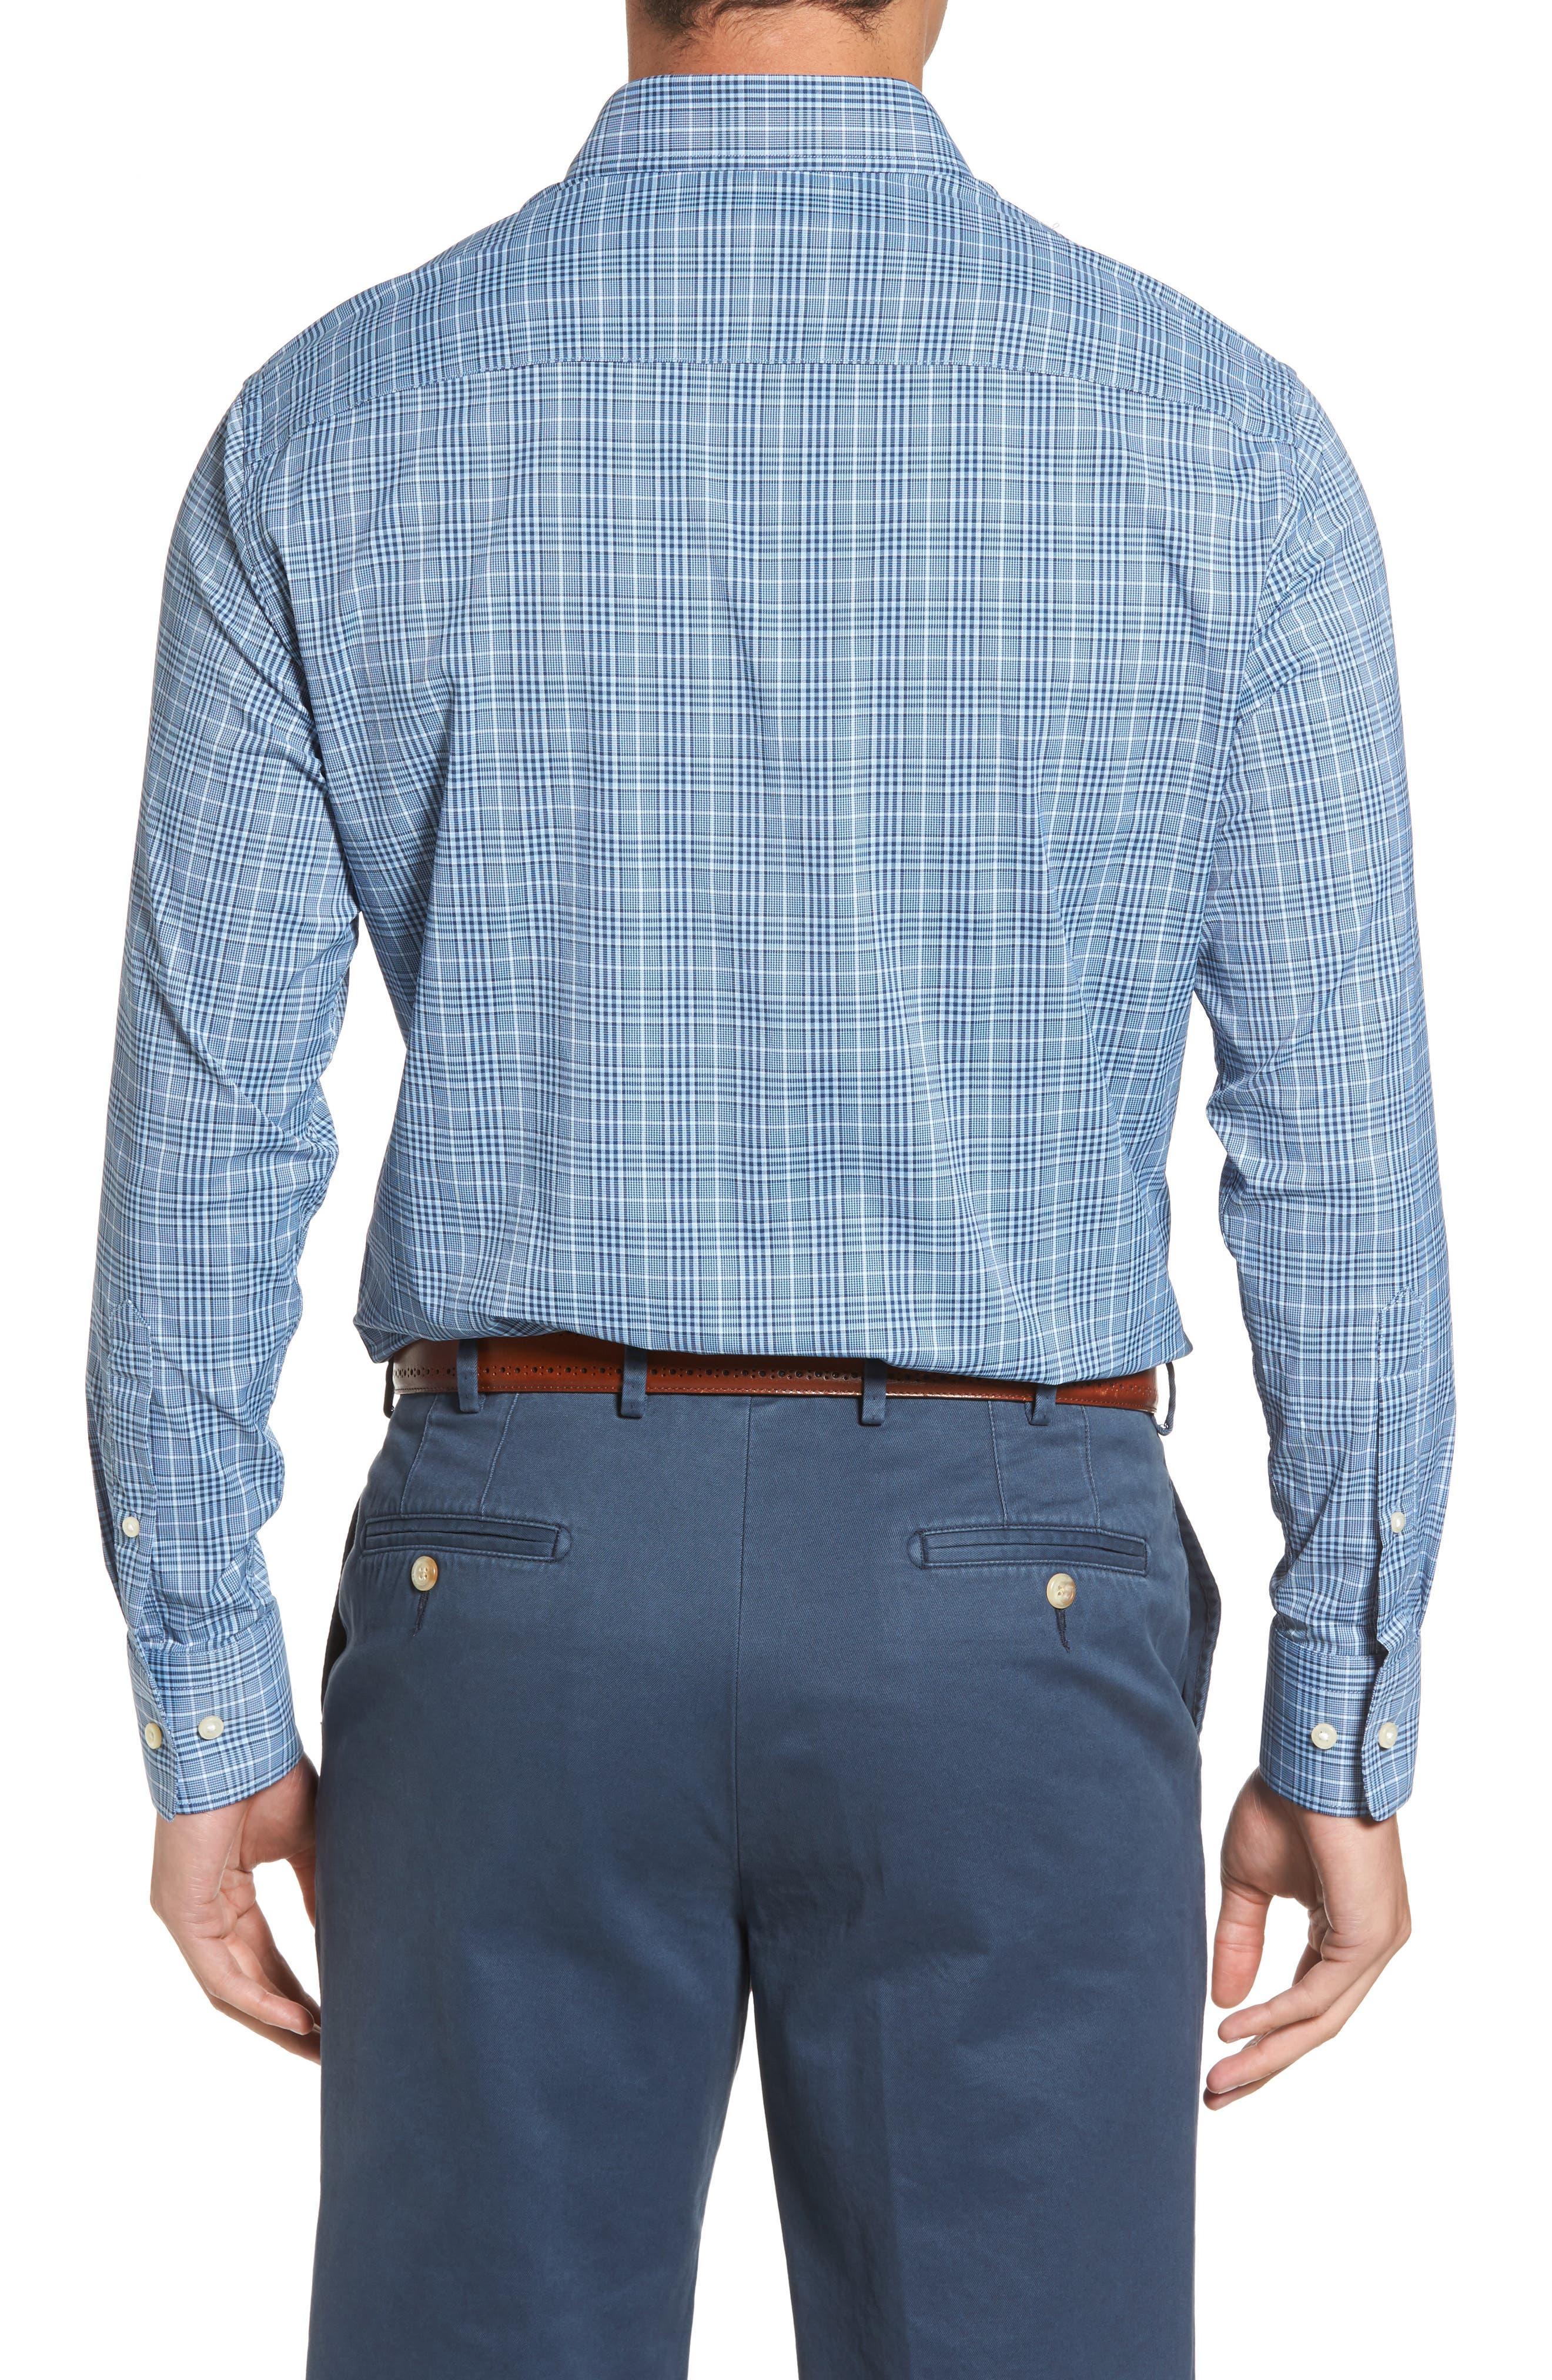 Honeycomb Regular Fit Glen Plaid Performance Sport Shirt,                             Alternate thumbnail 2, color,                             402